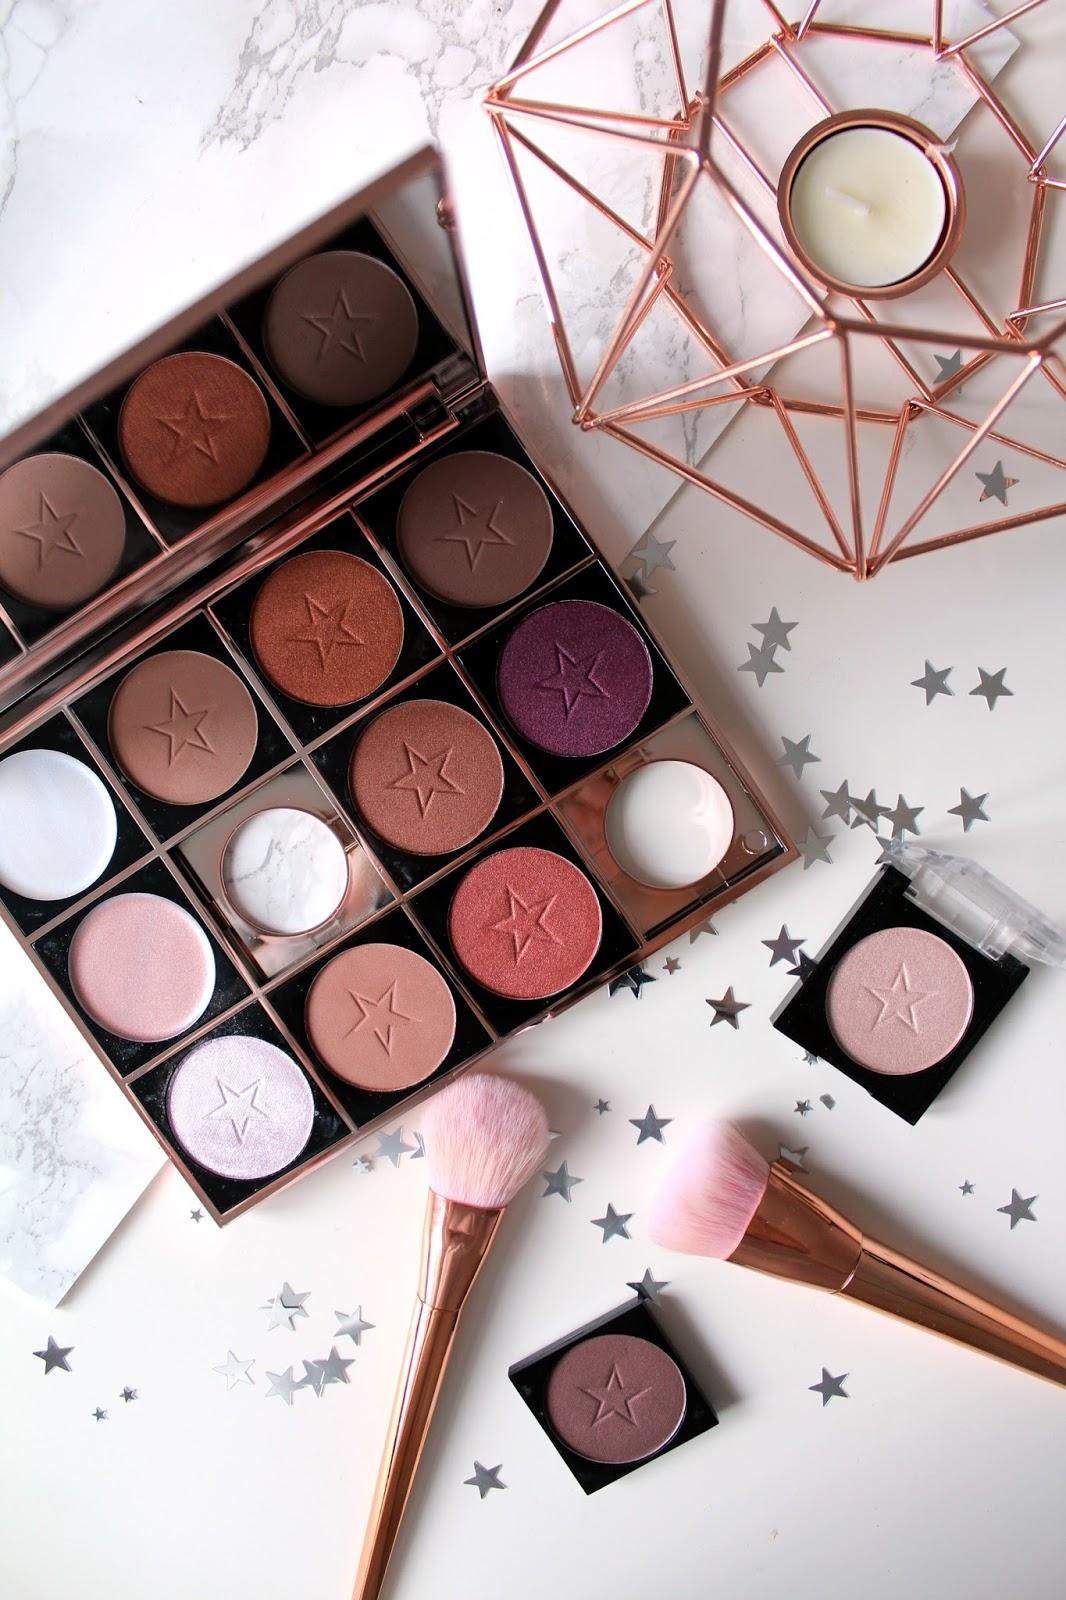 makeup obsession, custom palette, what's in my makeup obsession palette, swatches, reviews, highlight powder, strobe cream, eyeshadows, contour powder